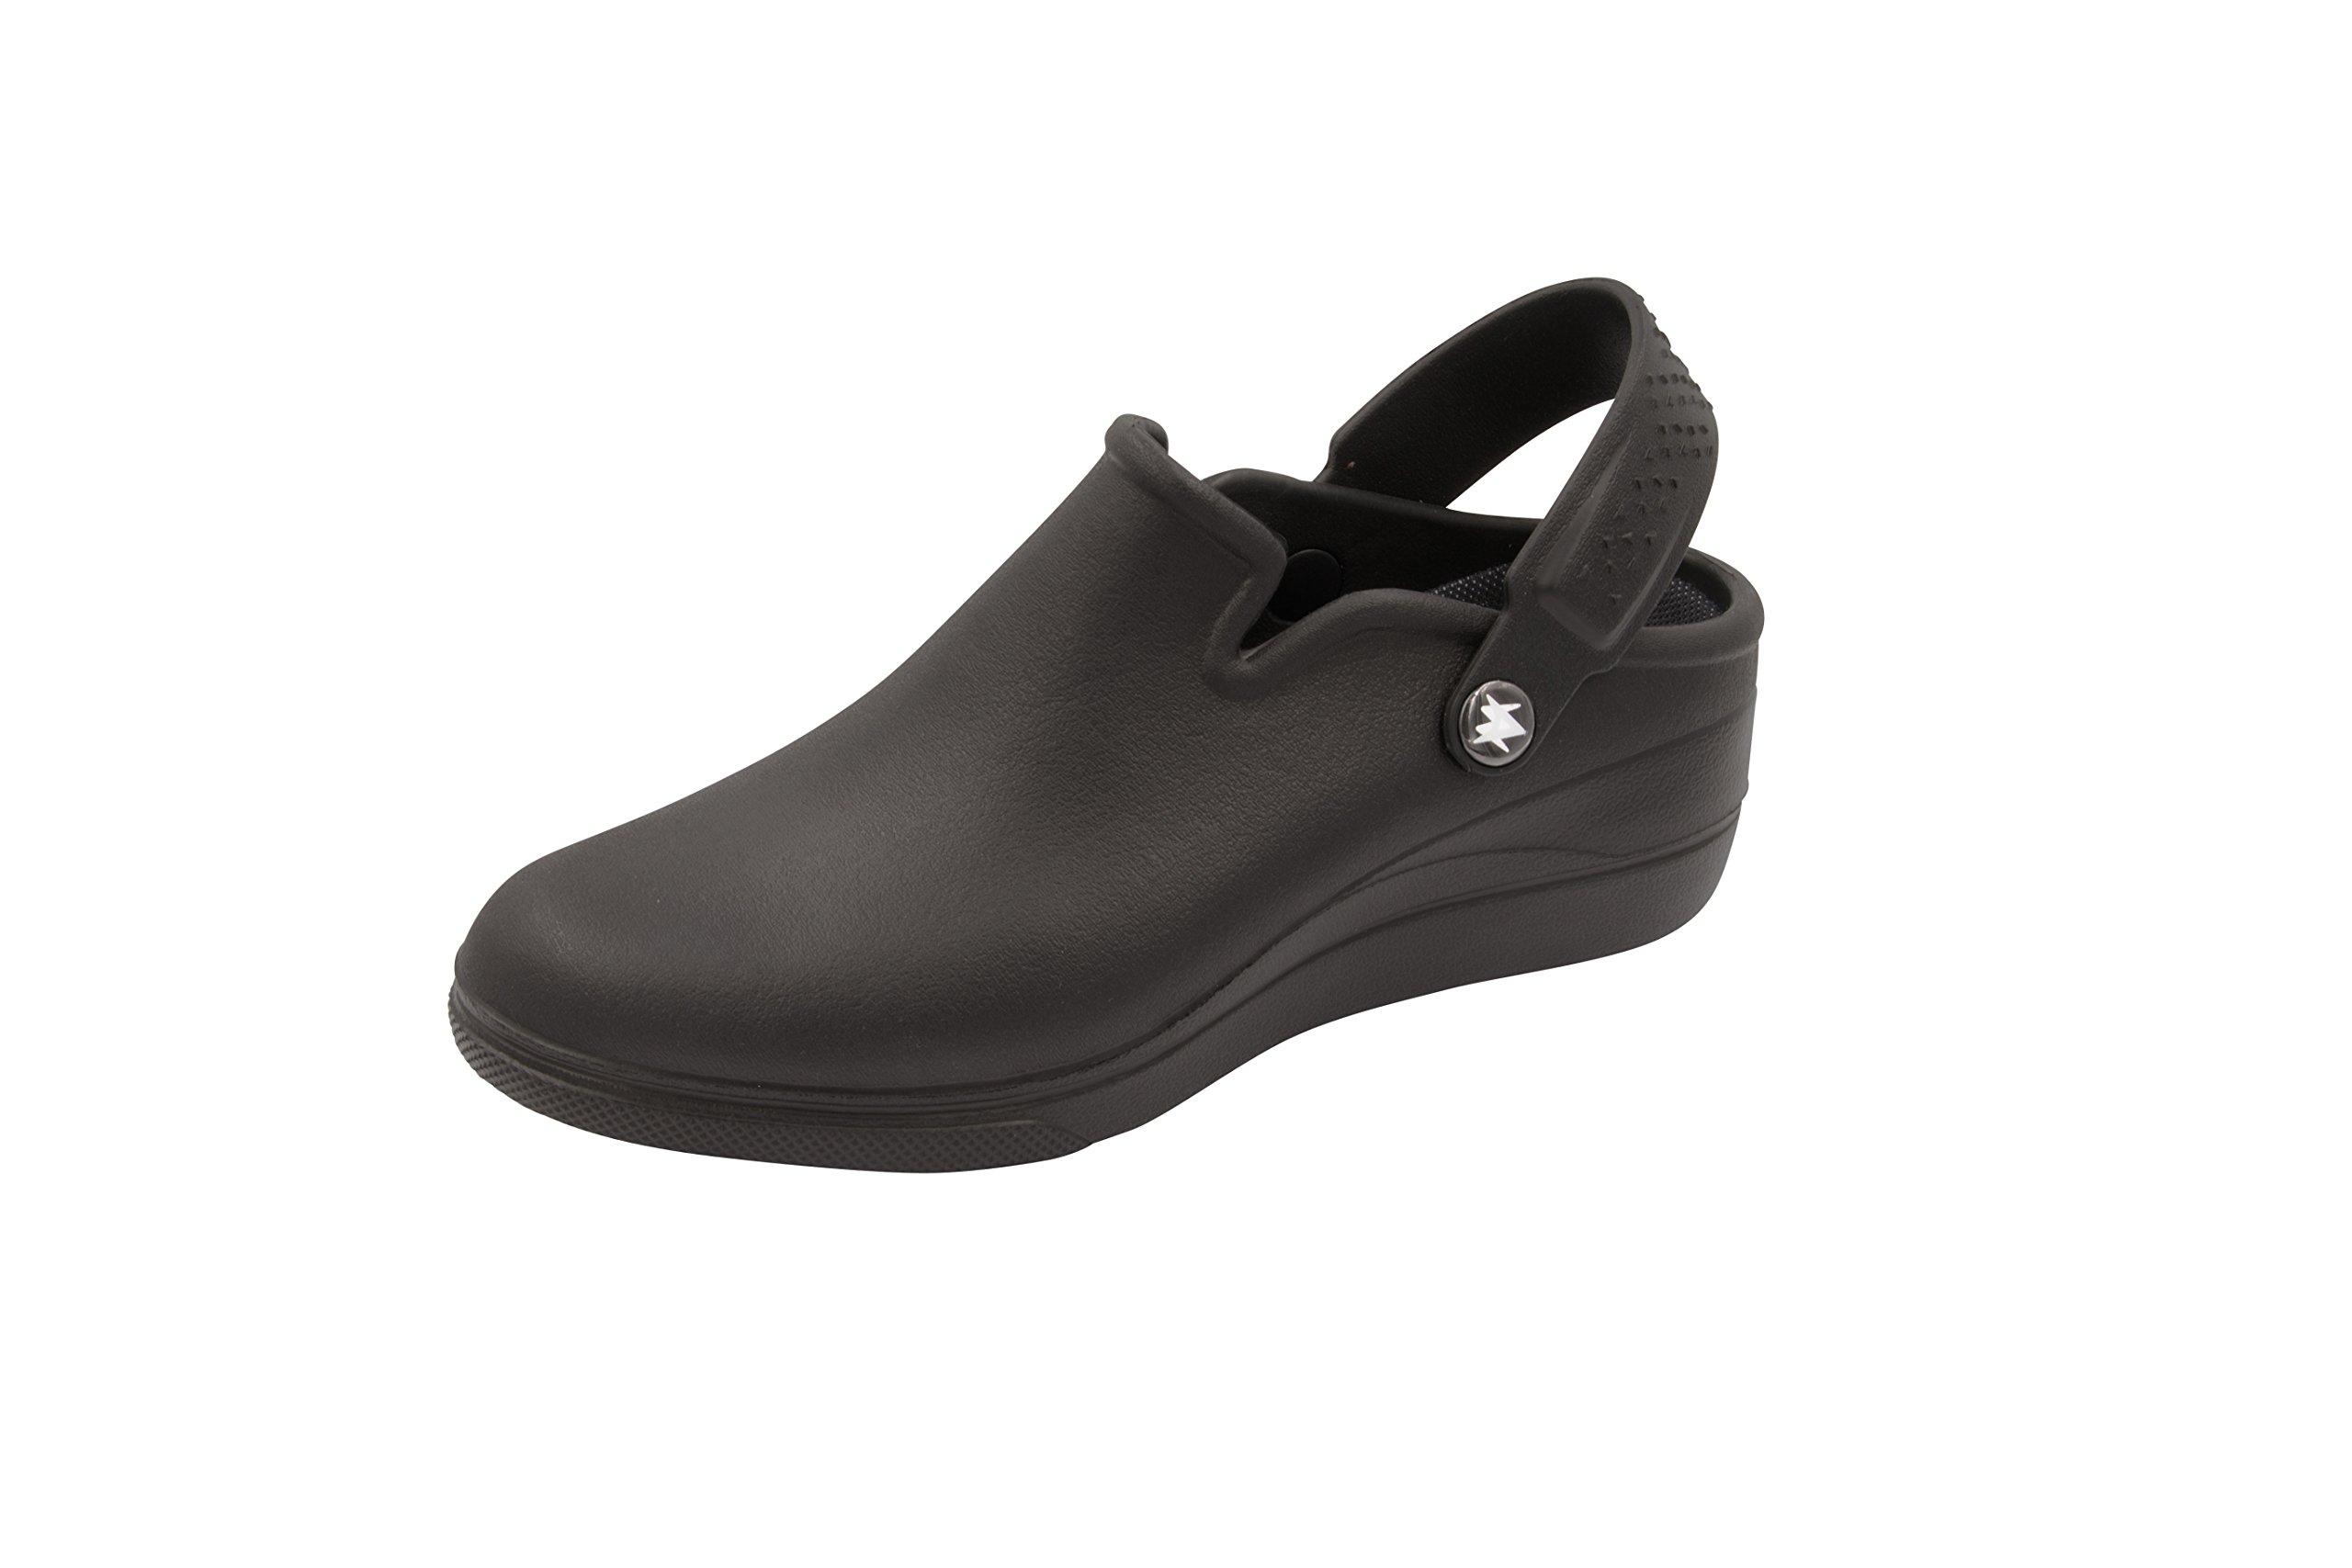 Anywear Women's Peak Health Care Professional Shoe, Black on Black, 8.0 Medium US